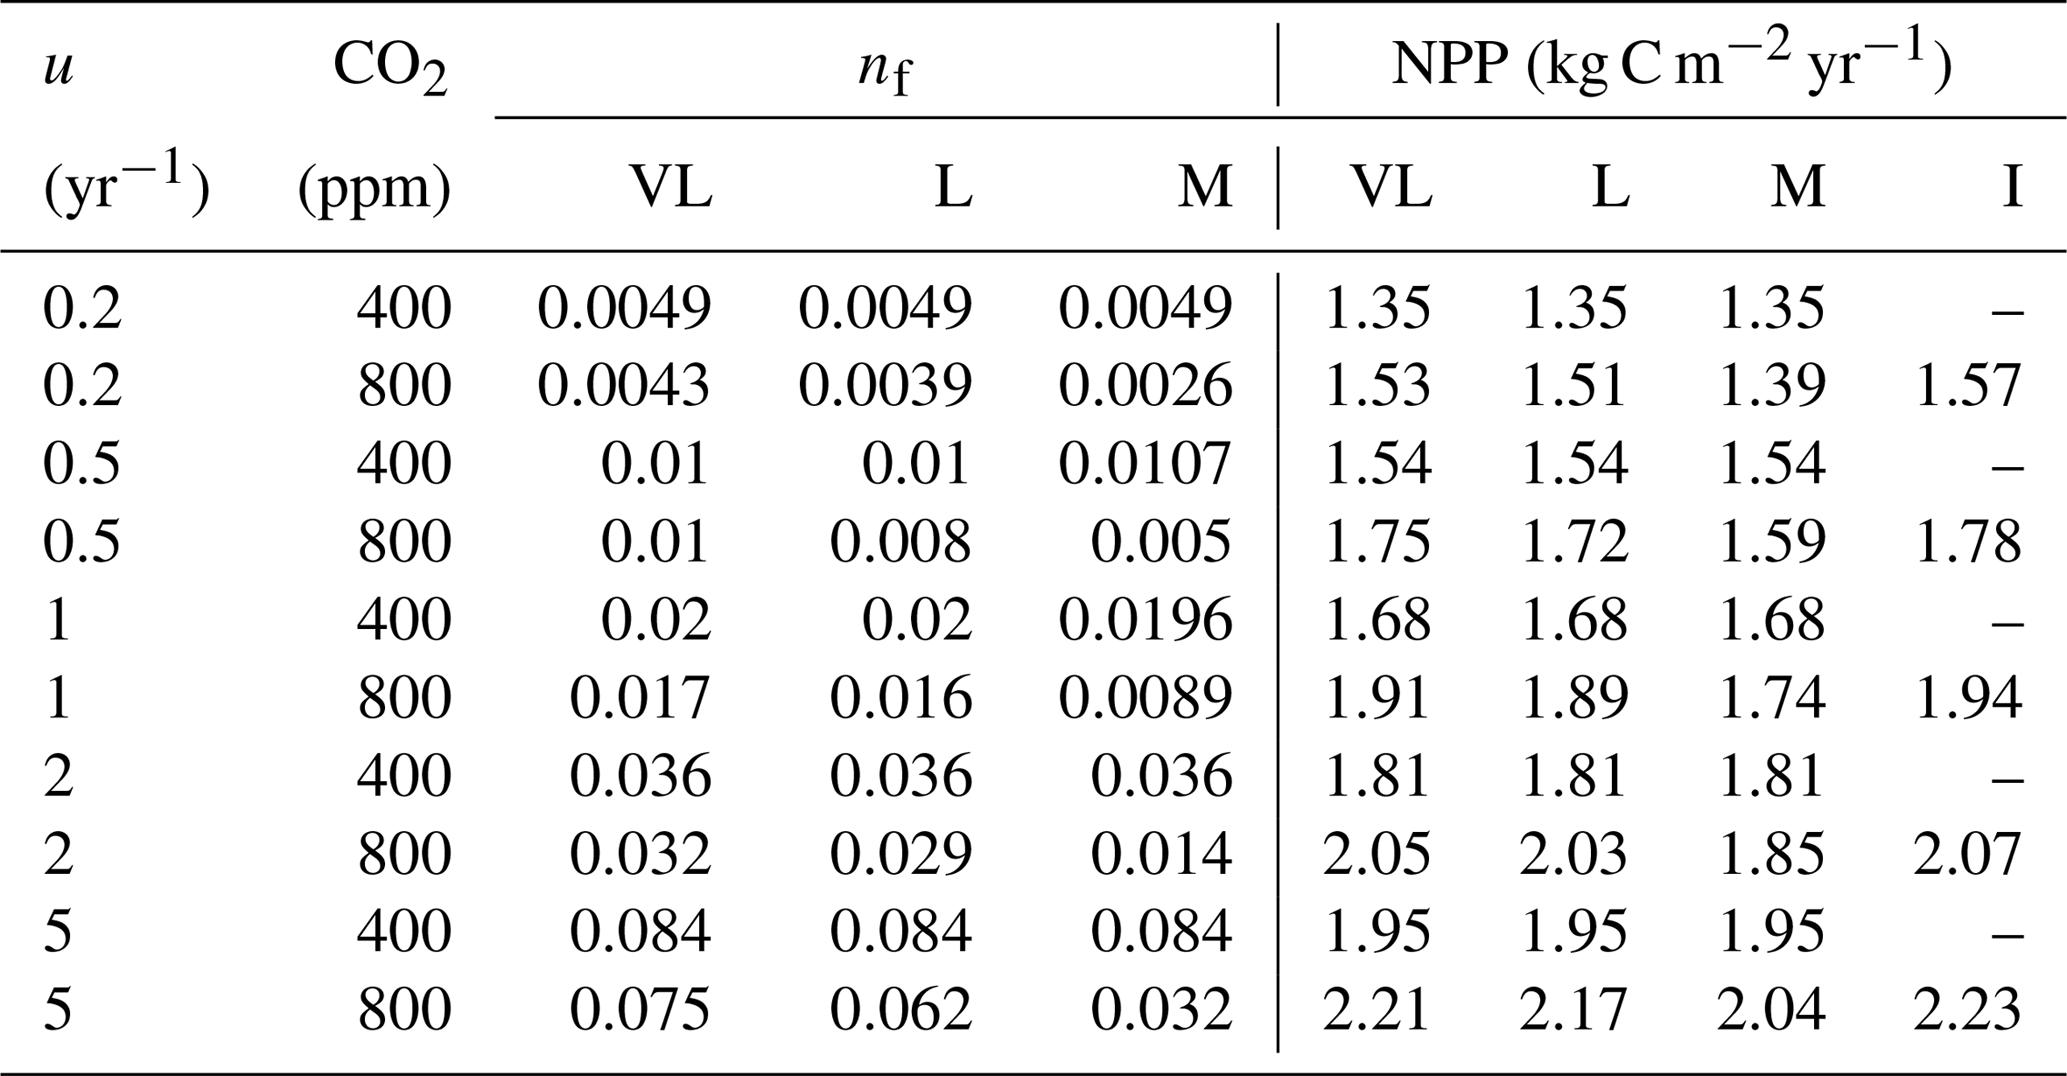 GMD - The quasi-equilibrium framework revisited: analyzing